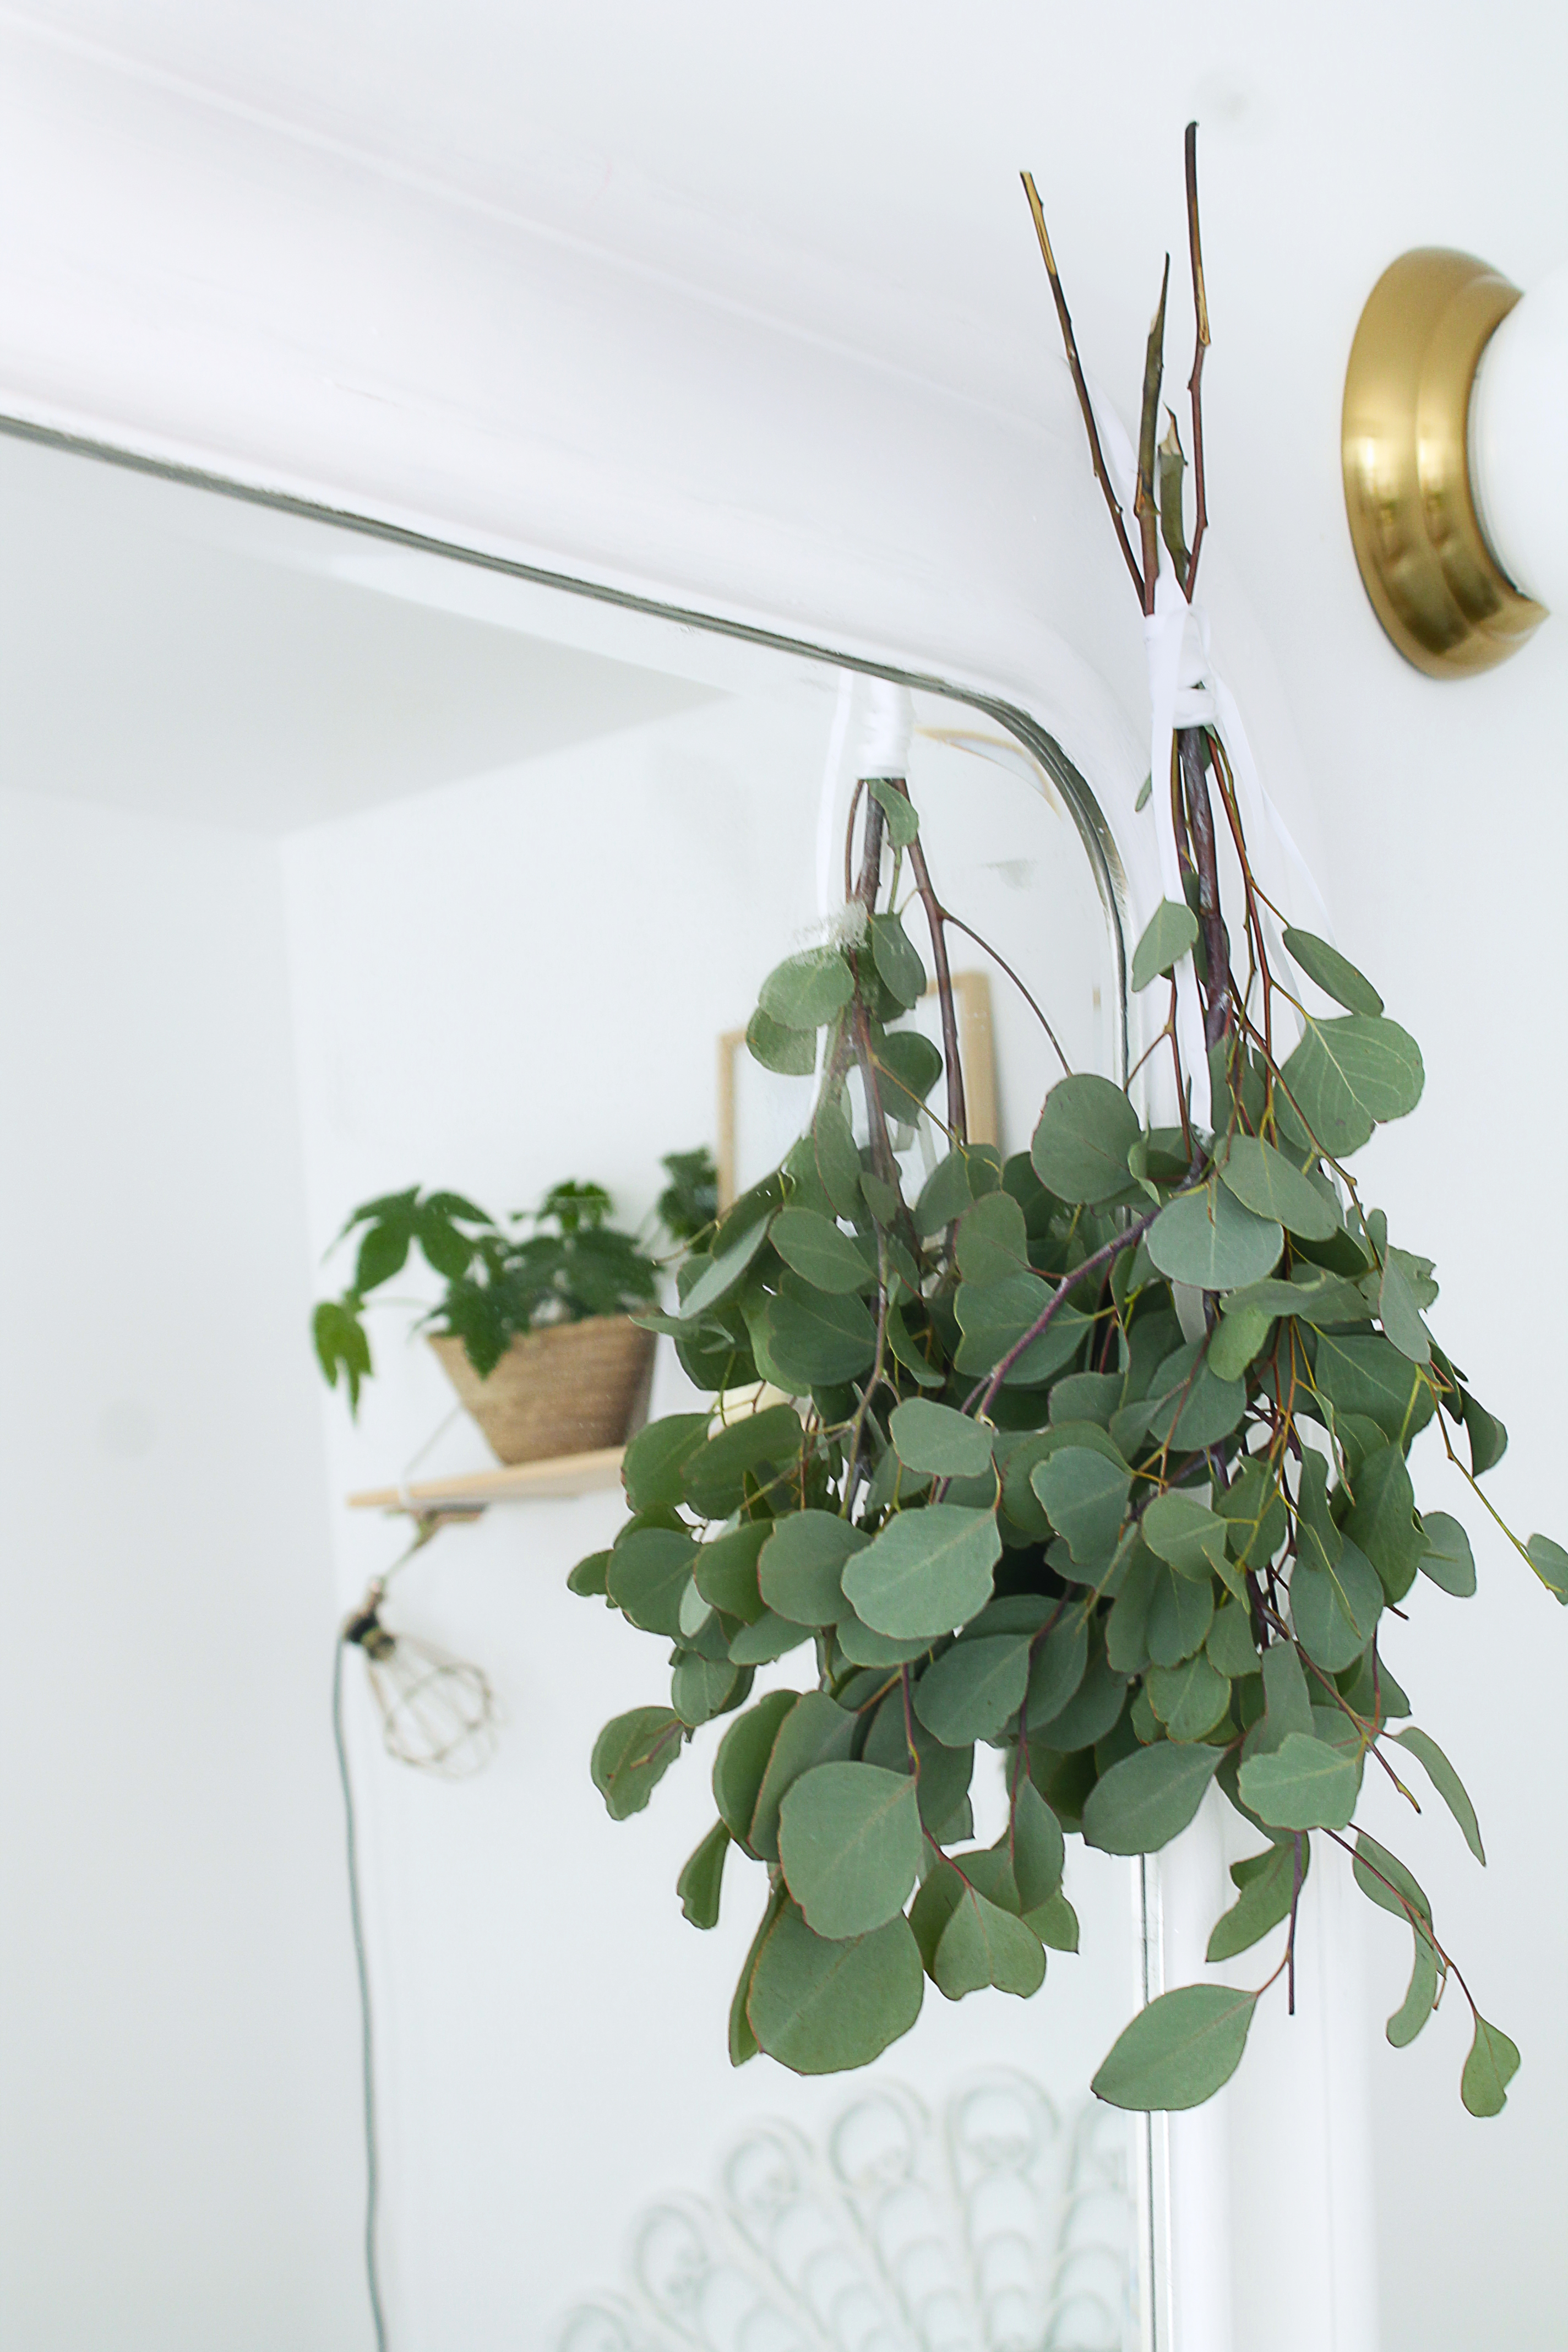 decoraiton-chaùbre-eucaliptus-seche-mademoiselle-claudine